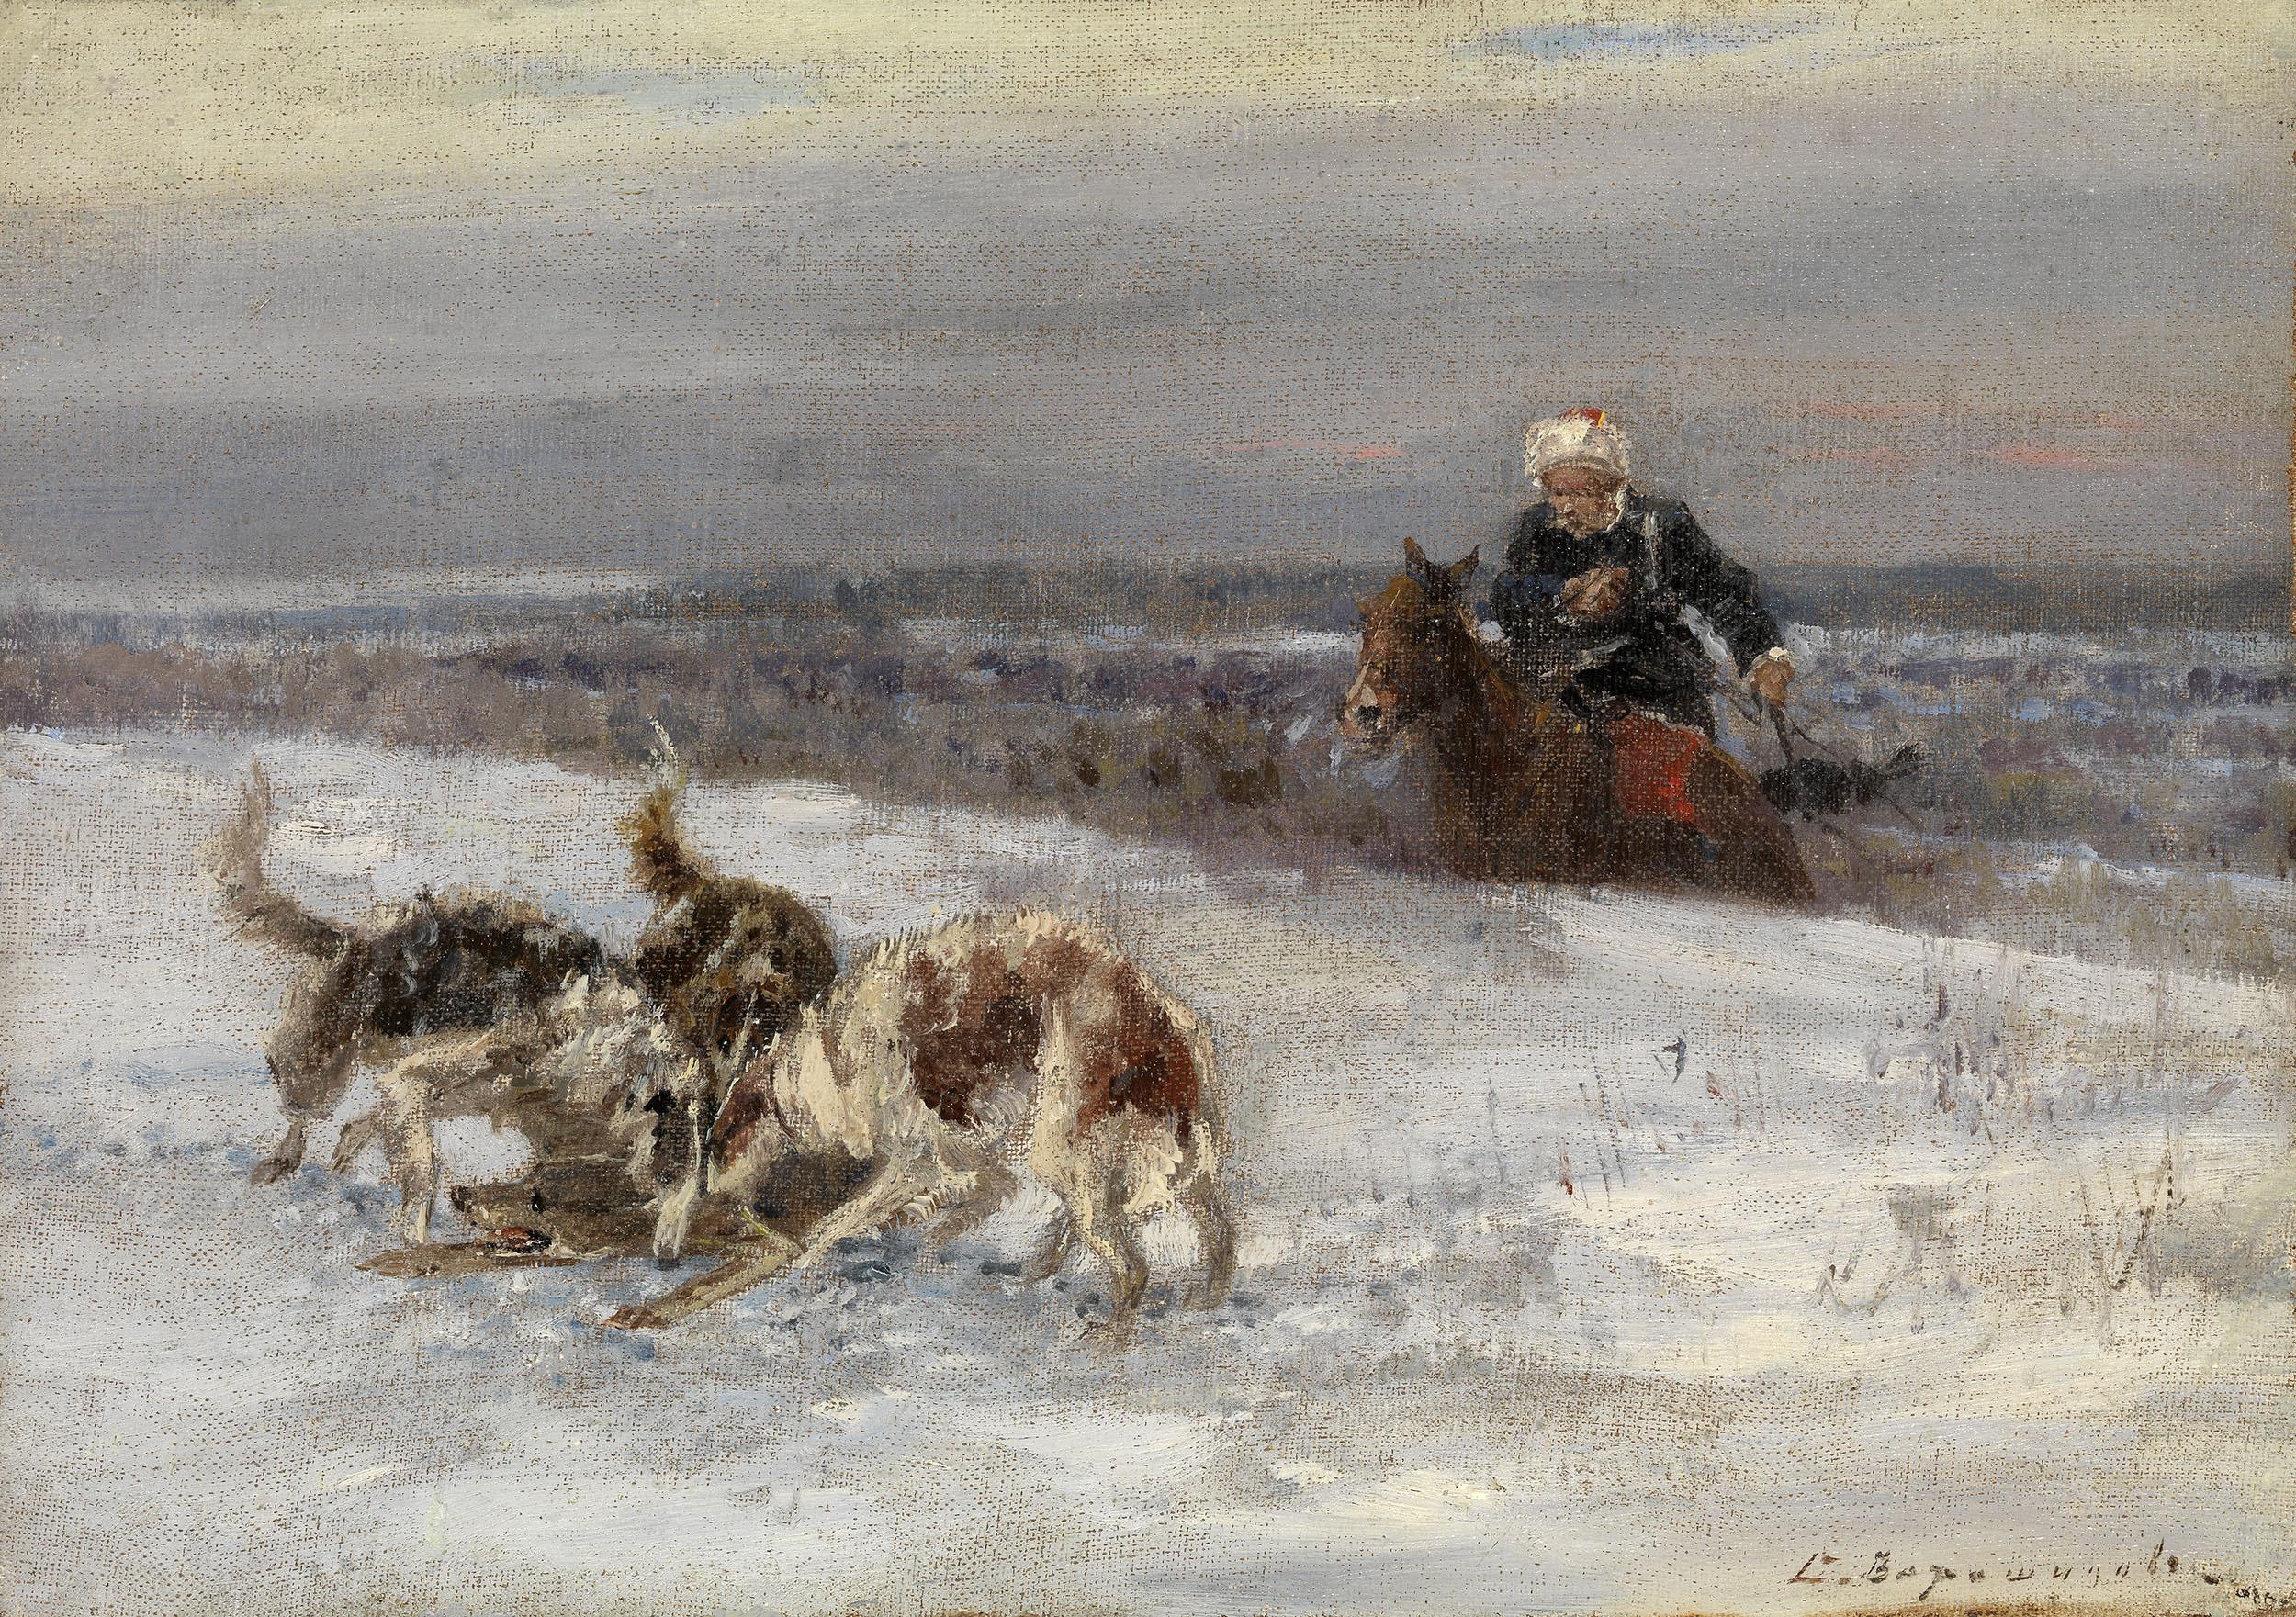 VOROSHILOV, SERGEI Hunting Scene